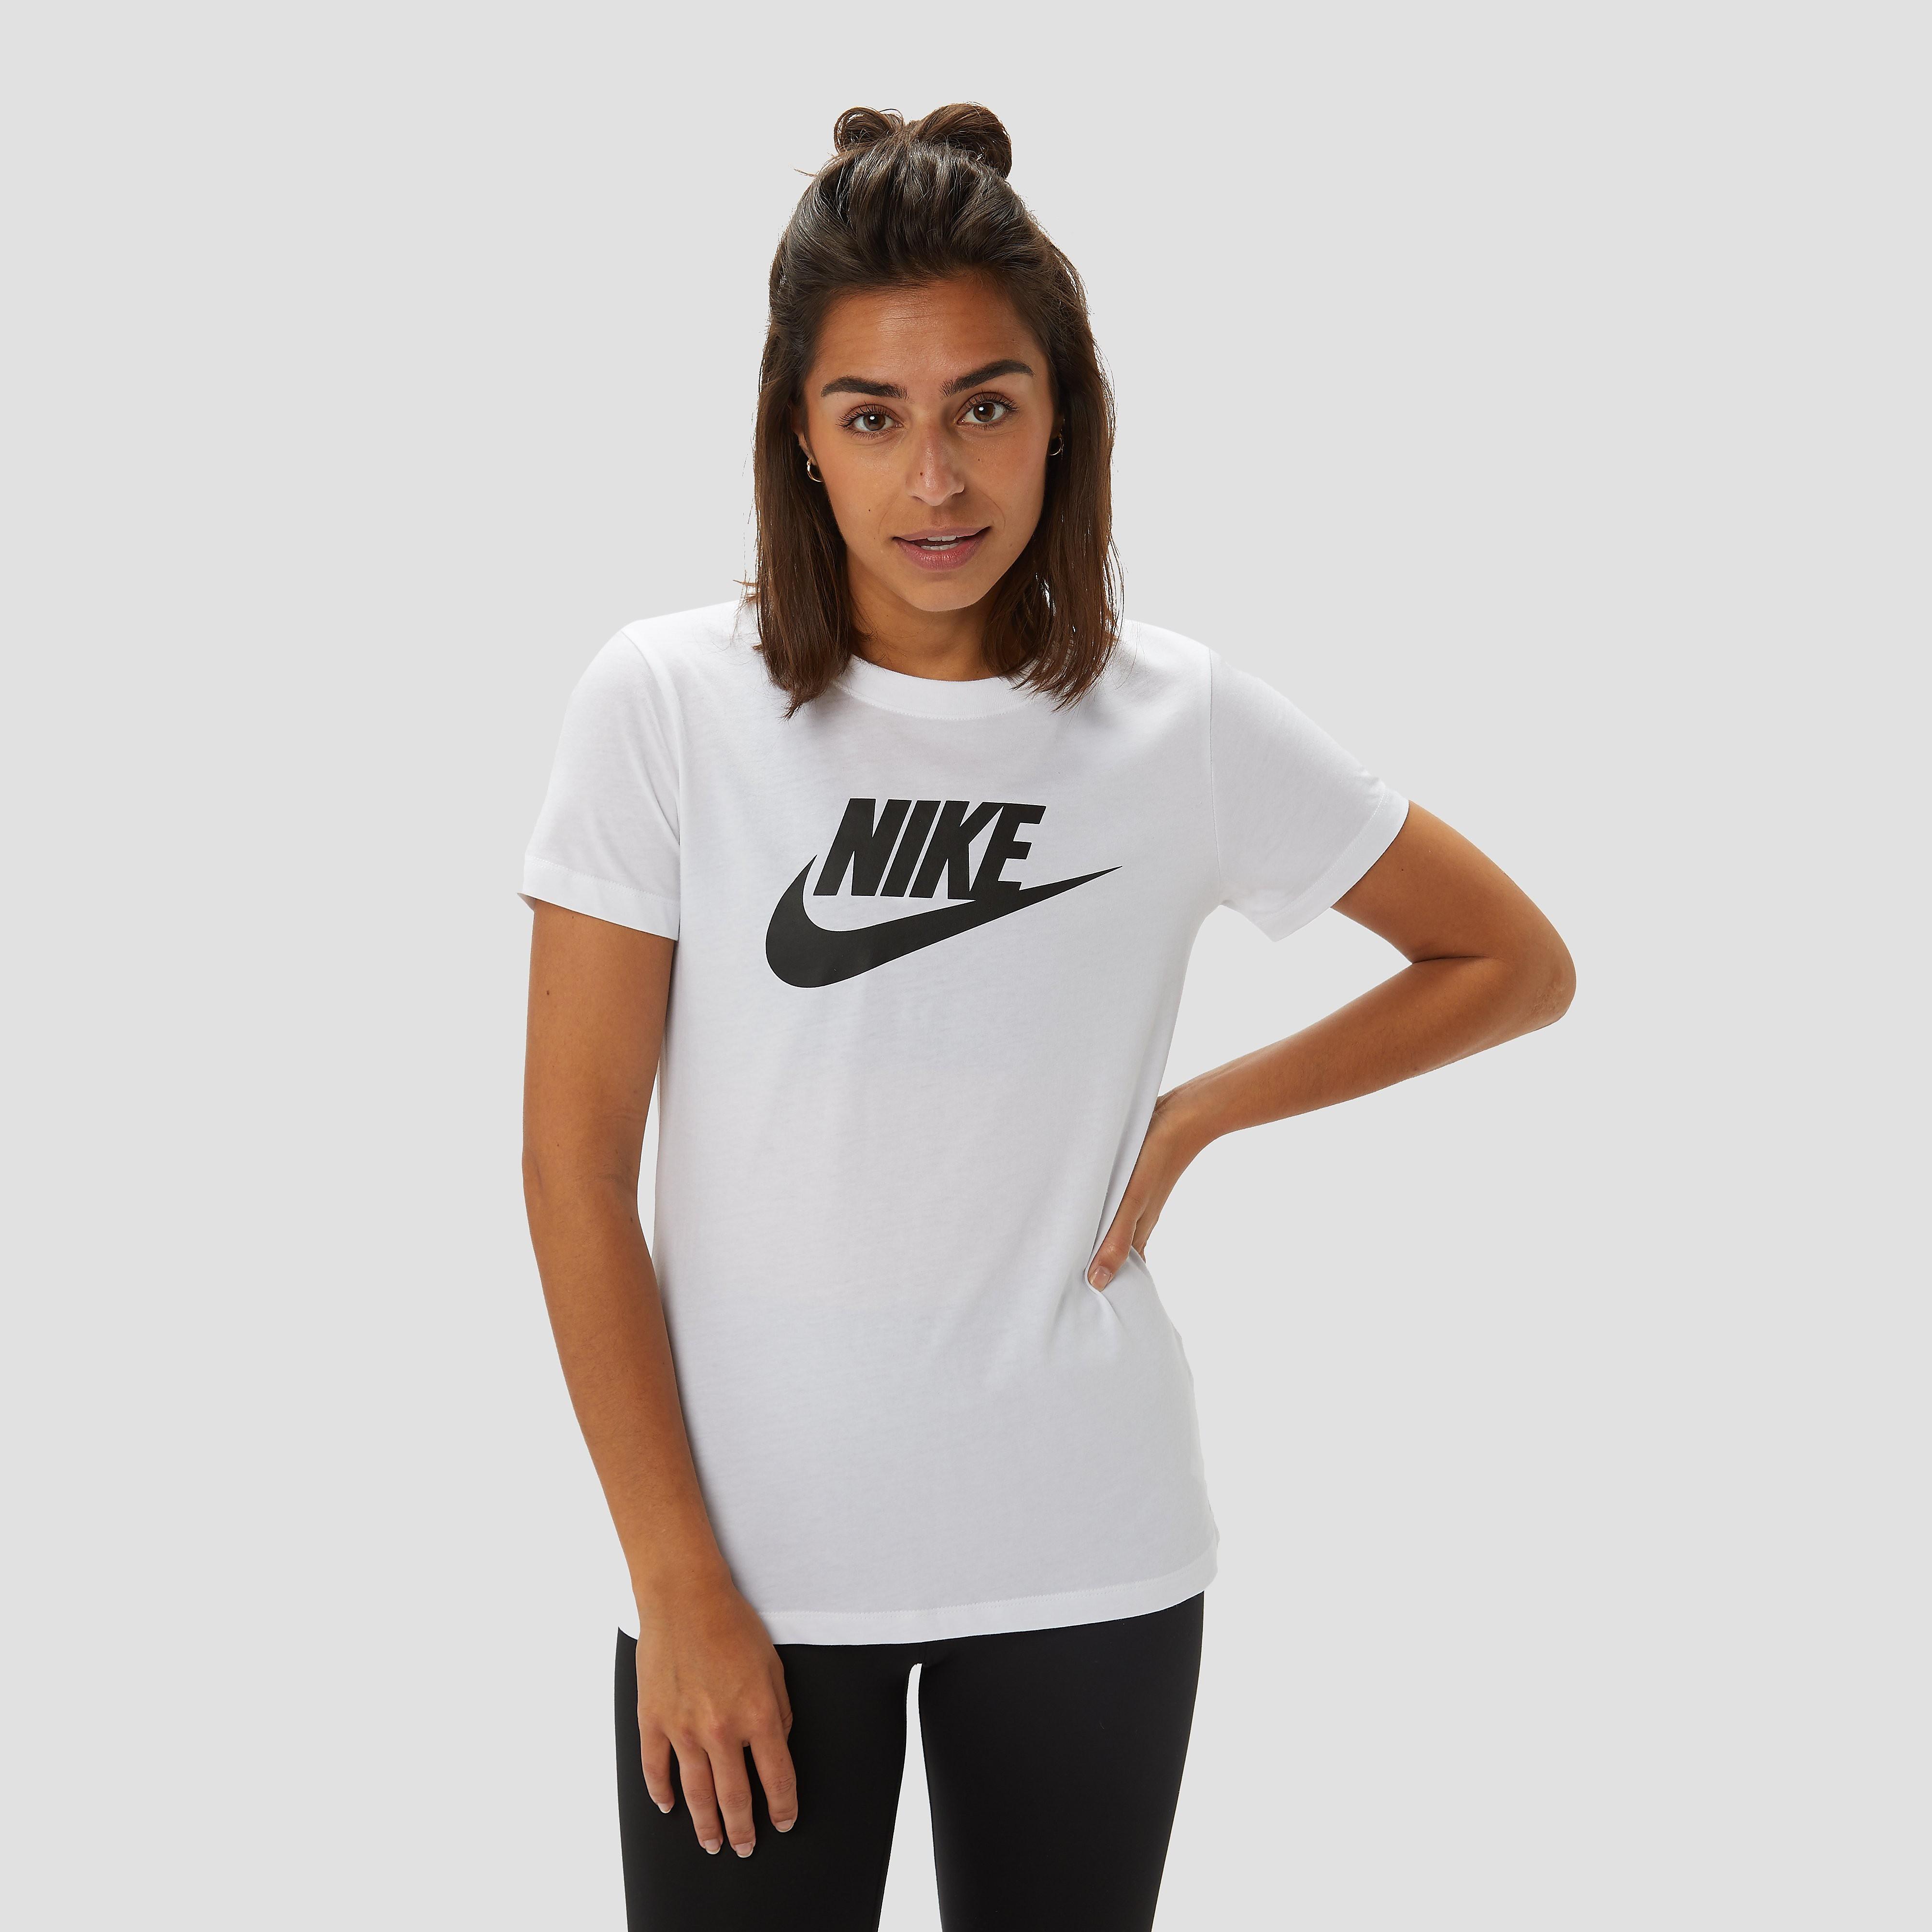 NIKE Sportswear essential icon shirt wit dames Dames